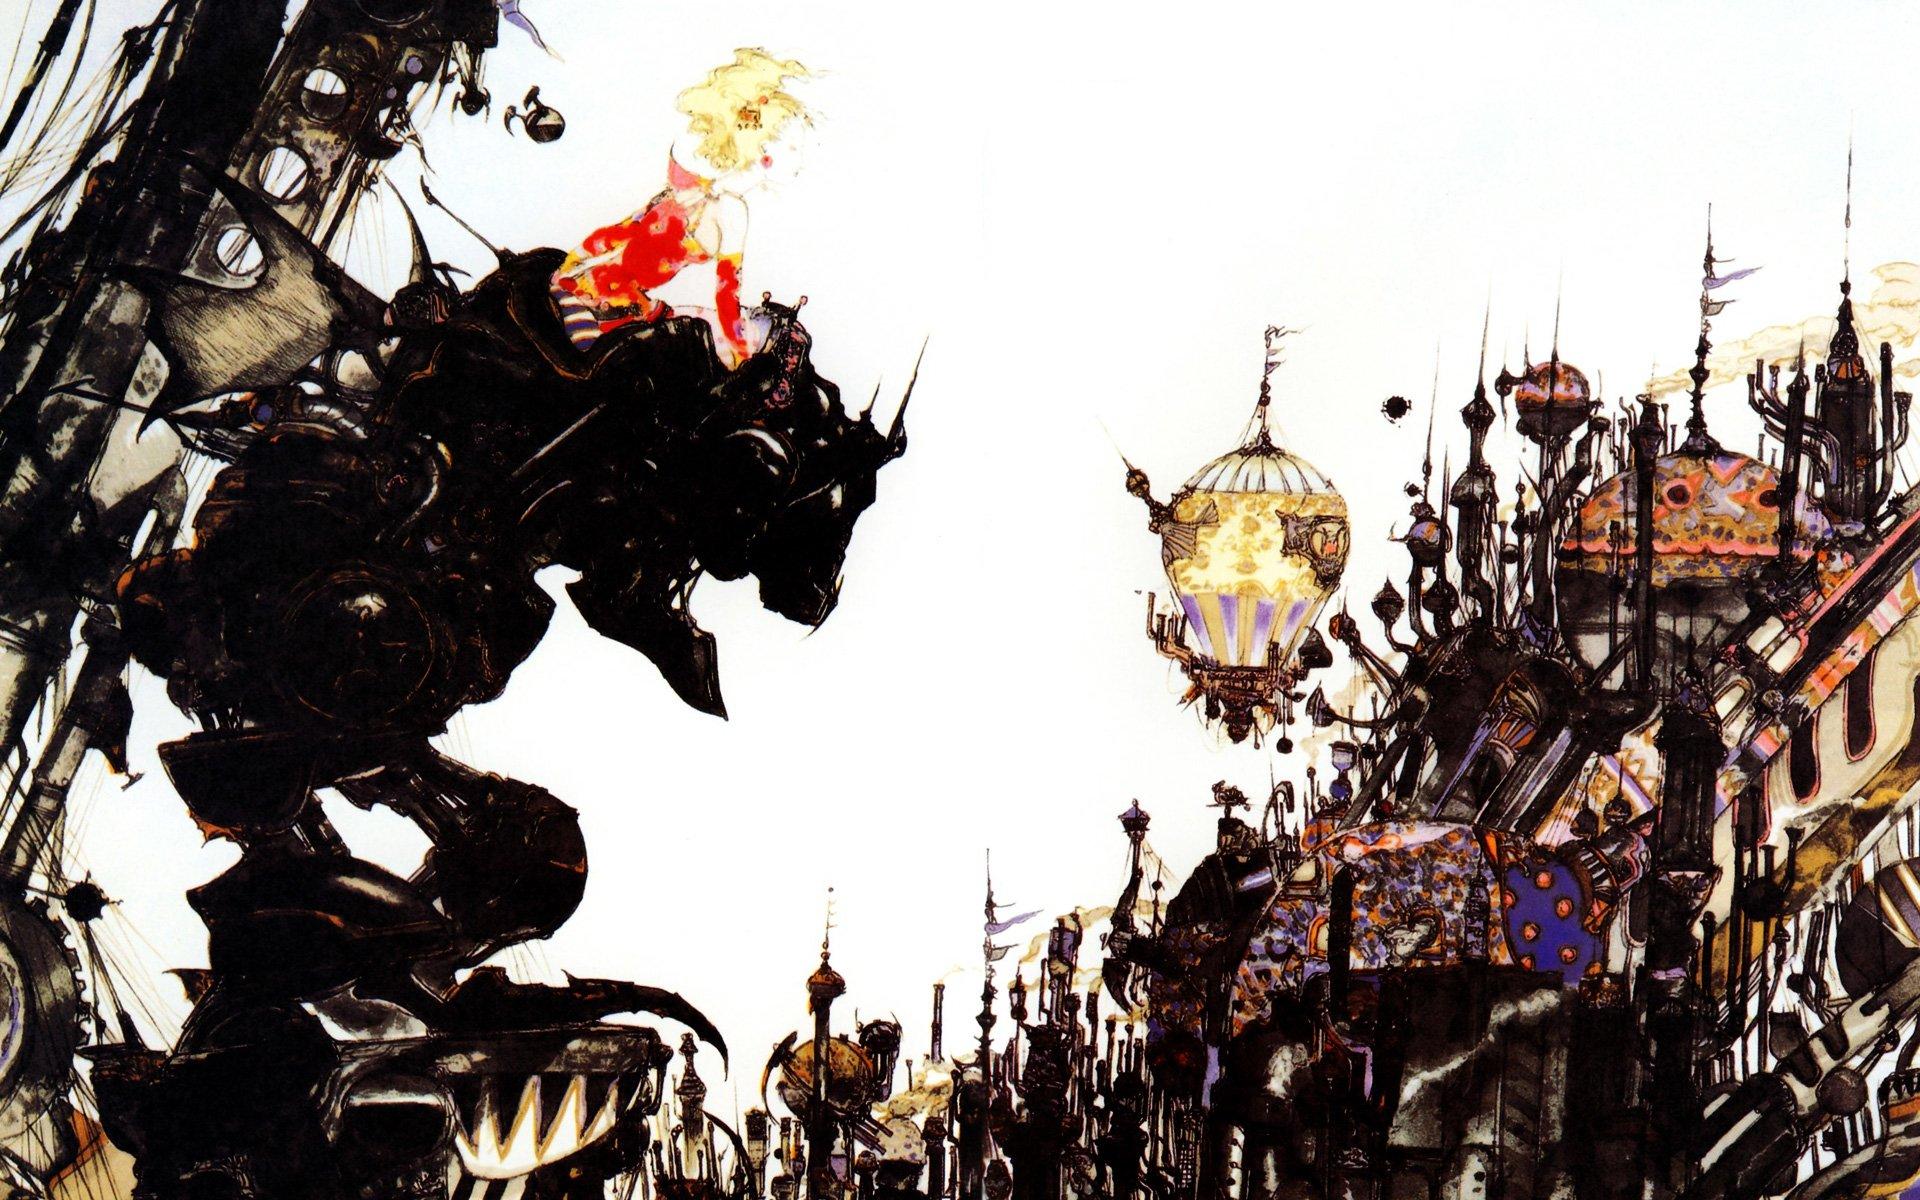 Video Game - Final Fantasy VI  Terra Branford Wallpaper